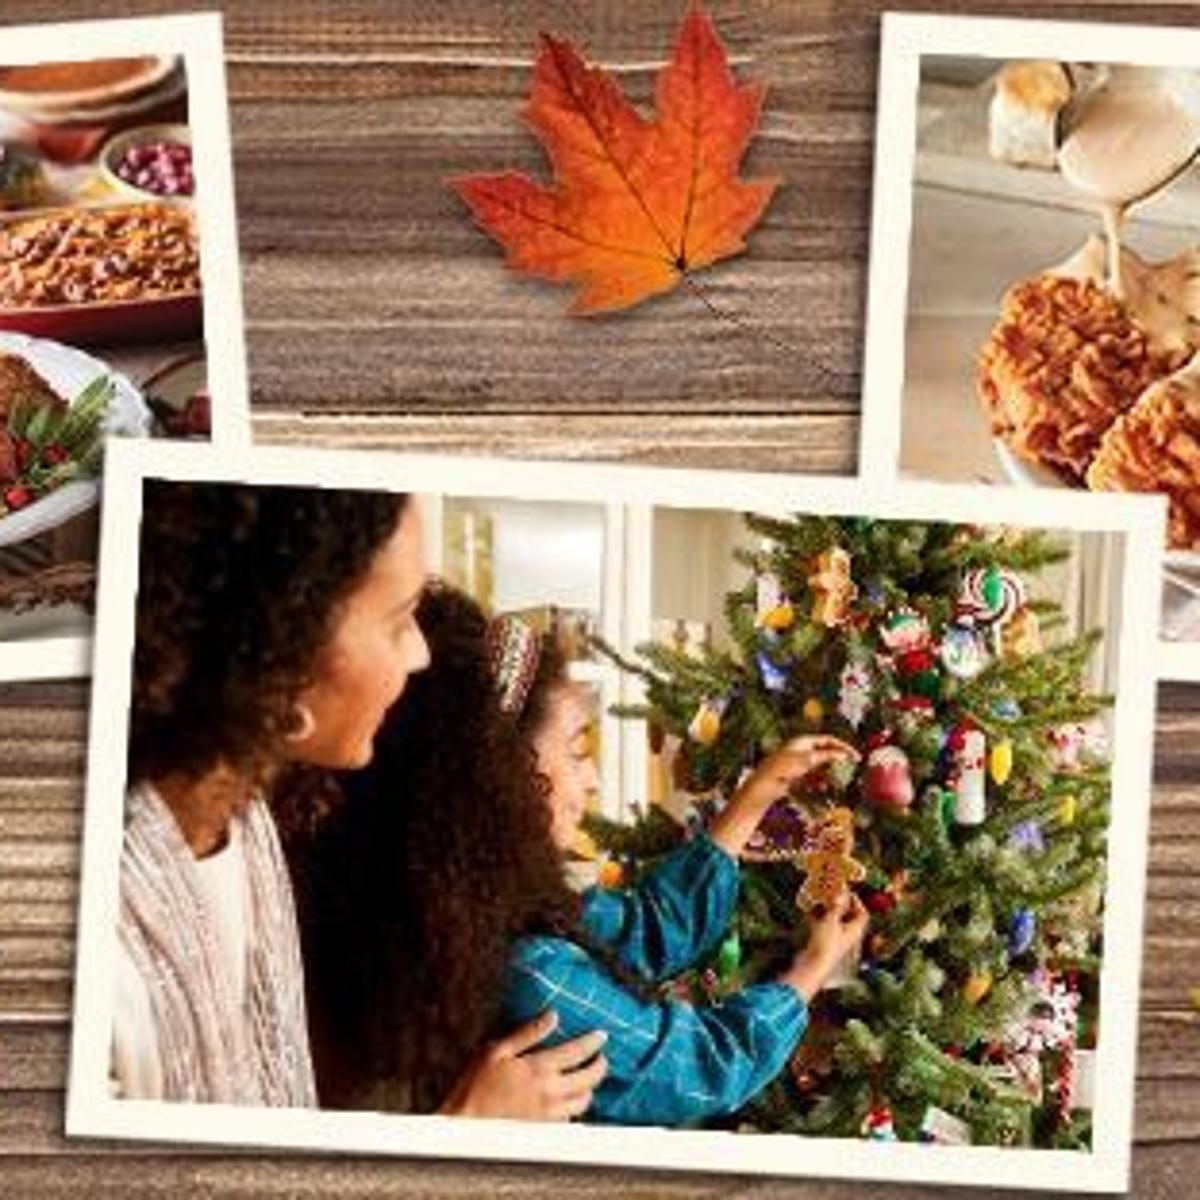 Lincoln restaurants open on Thanksgiving | Dining | journalstar.com